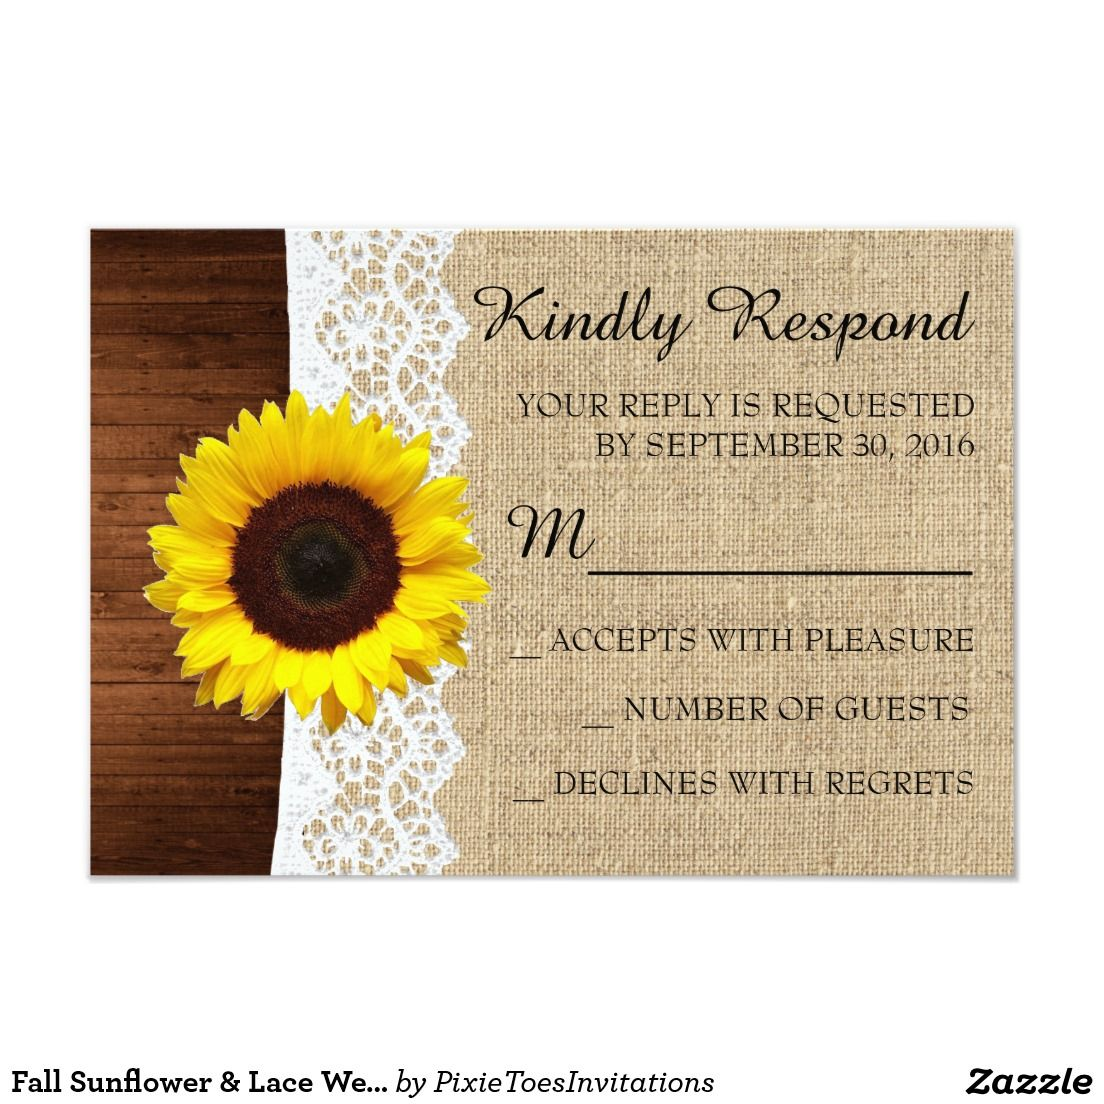 Fall Sunflower & Lace Wedding Invitation RSVP Card